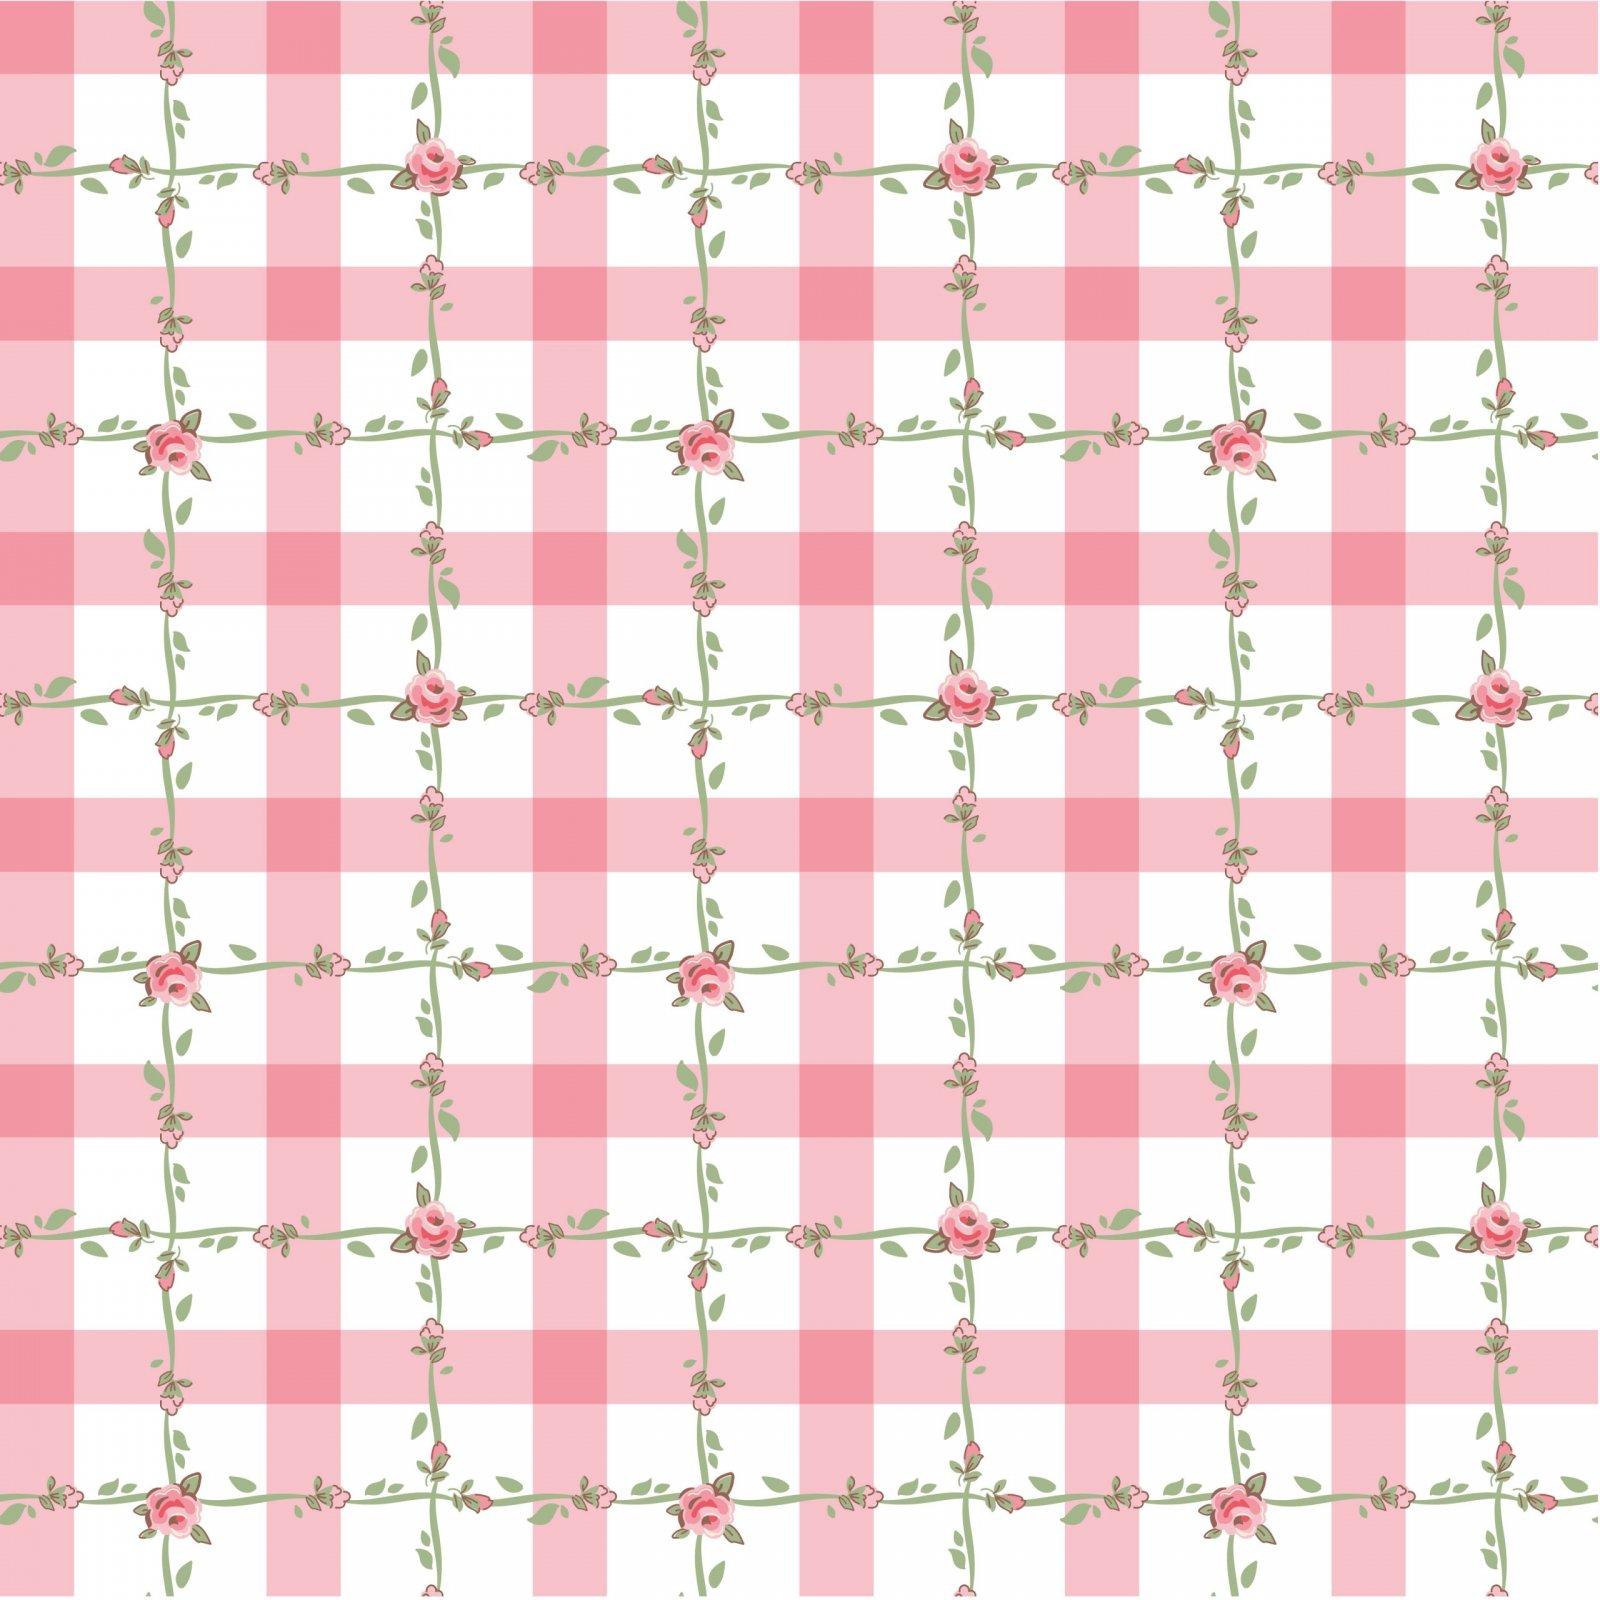 Dots & Posies 20419 Criss Cross